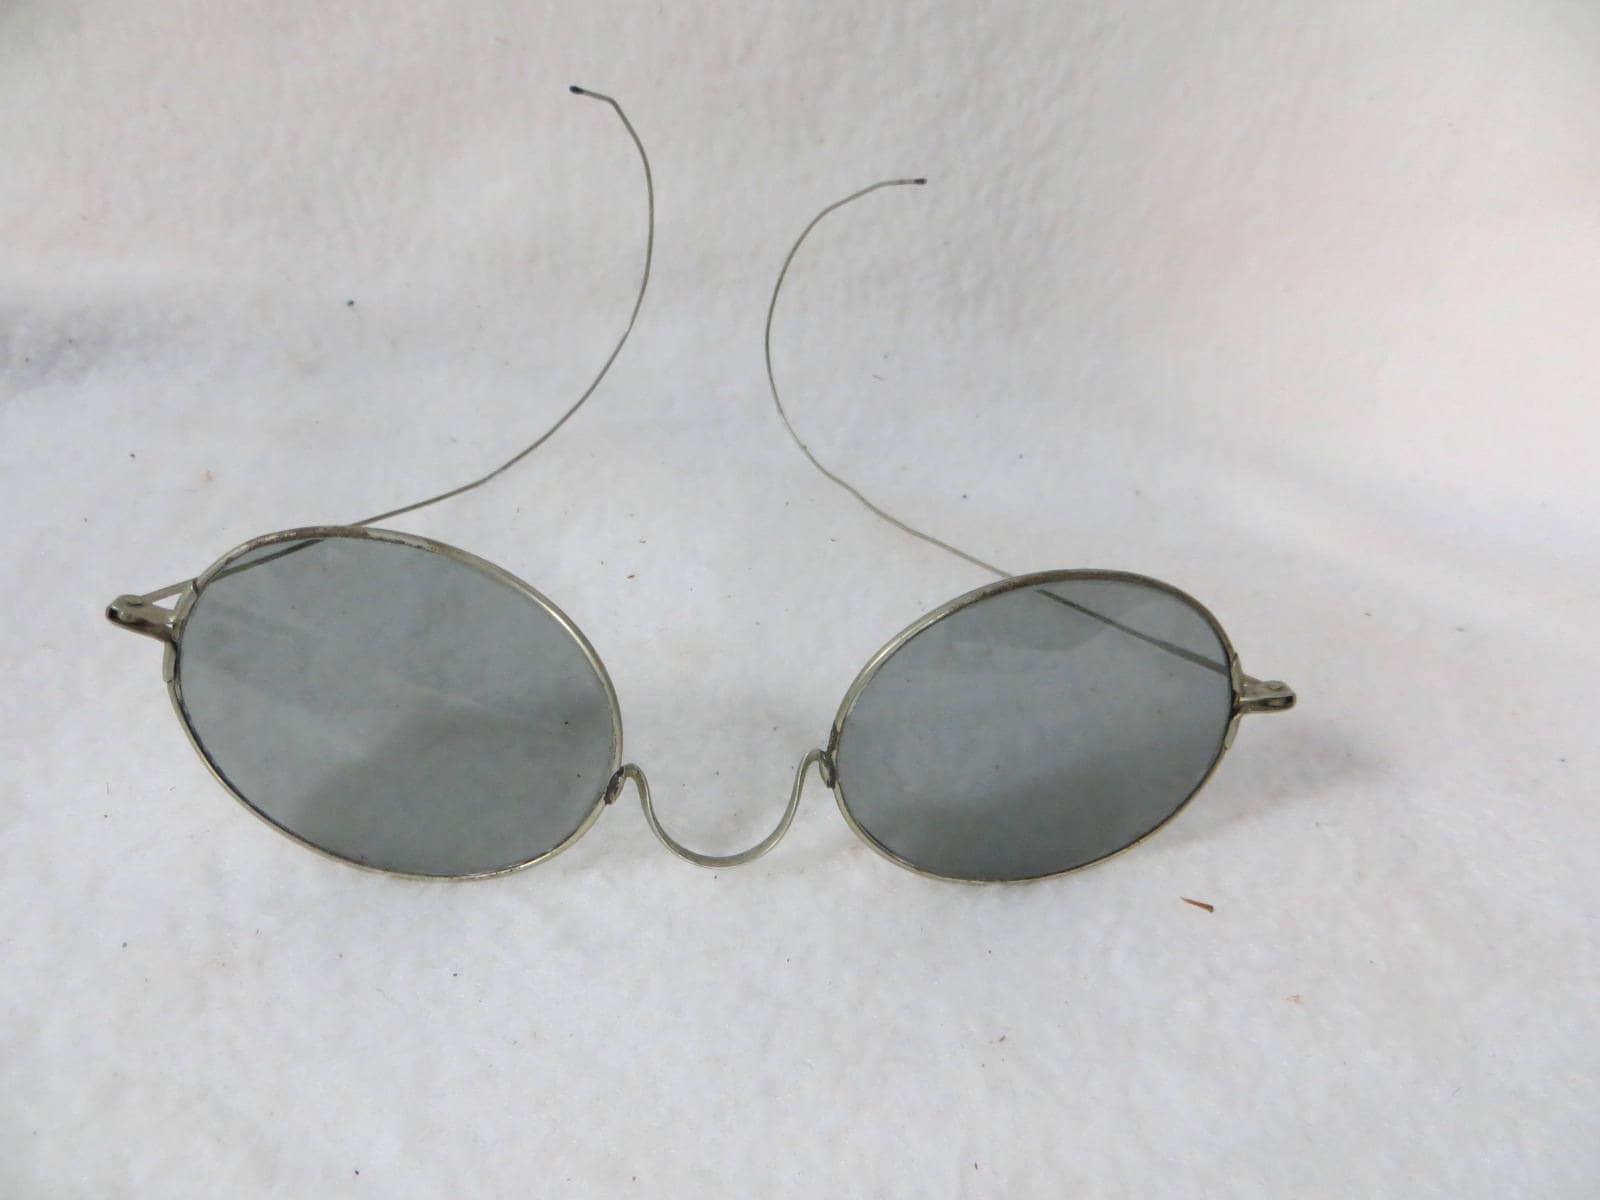 Antike Sonnenbrille Vintage Brille Draht umrandeten